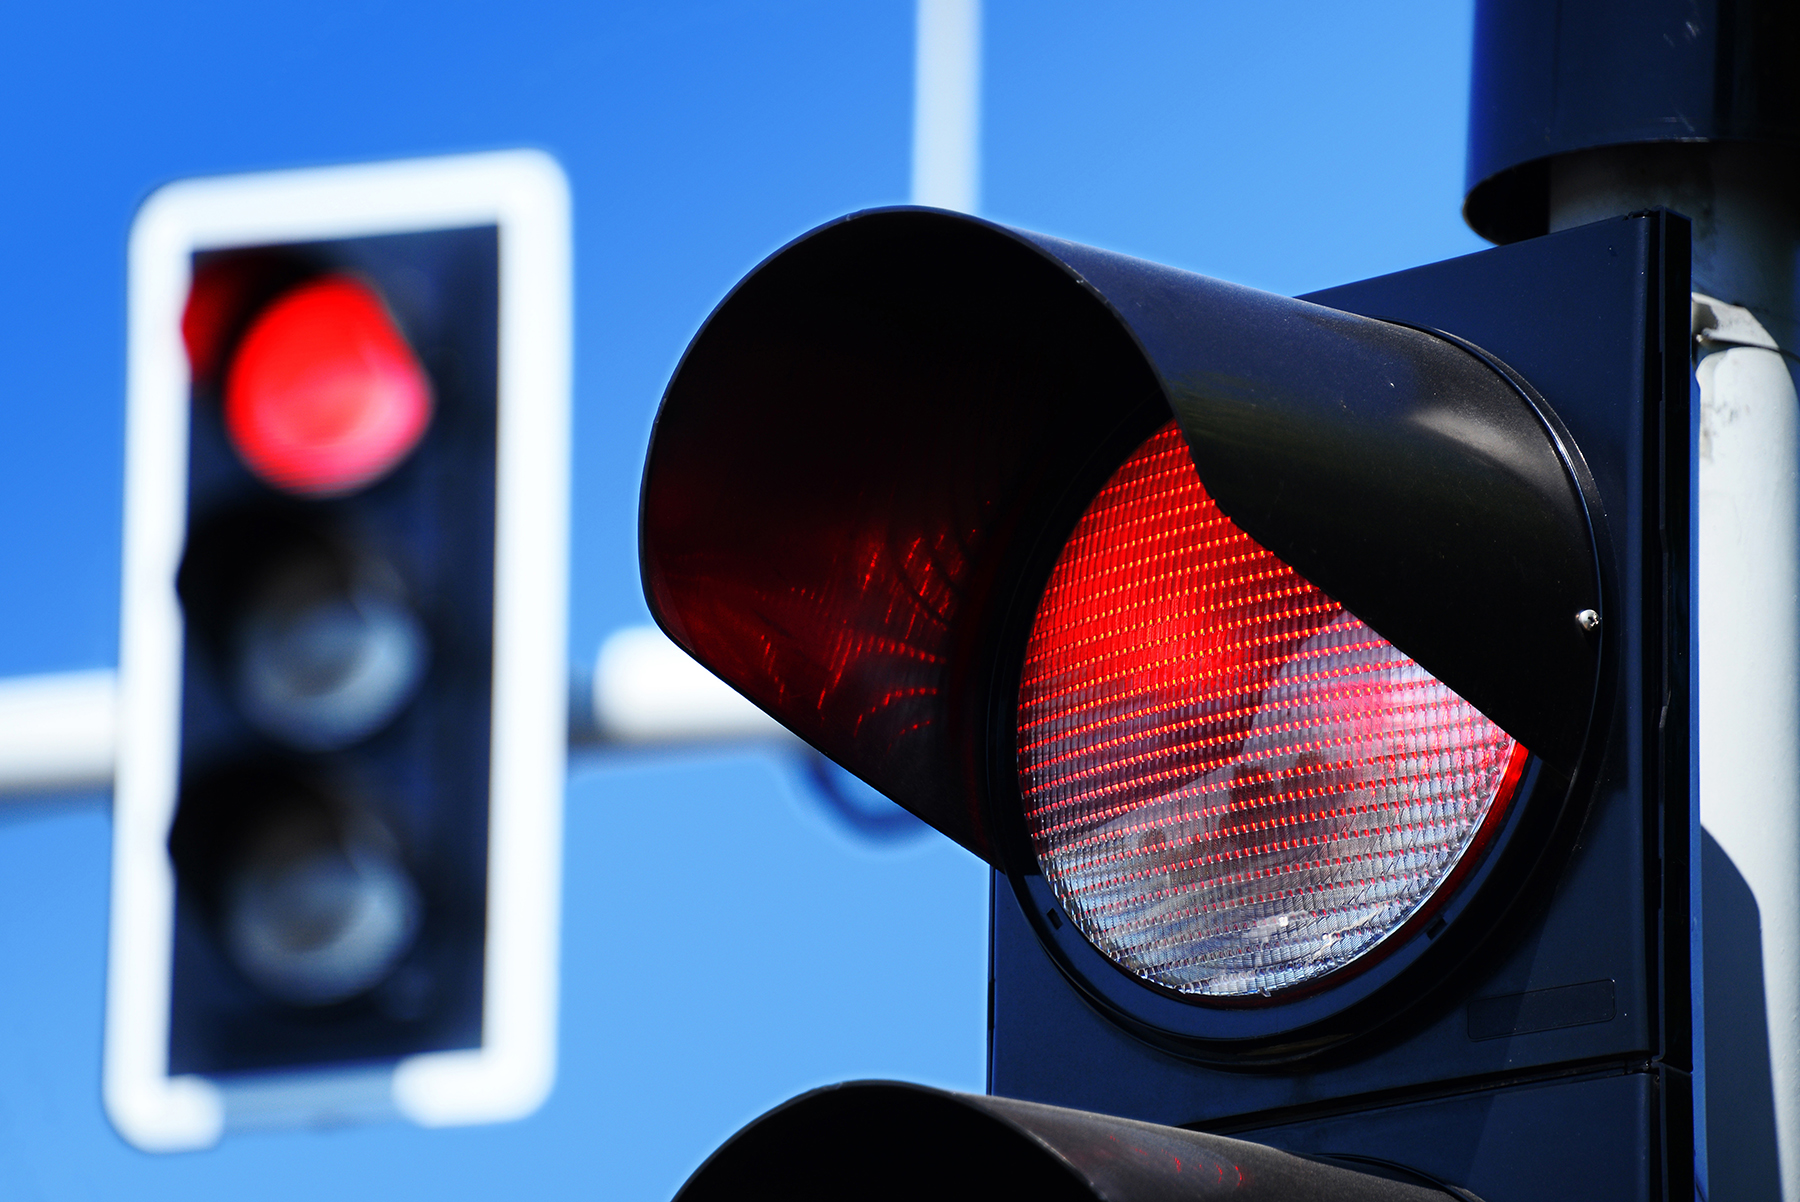 флешку компу картинка светофор с красным светом кларк